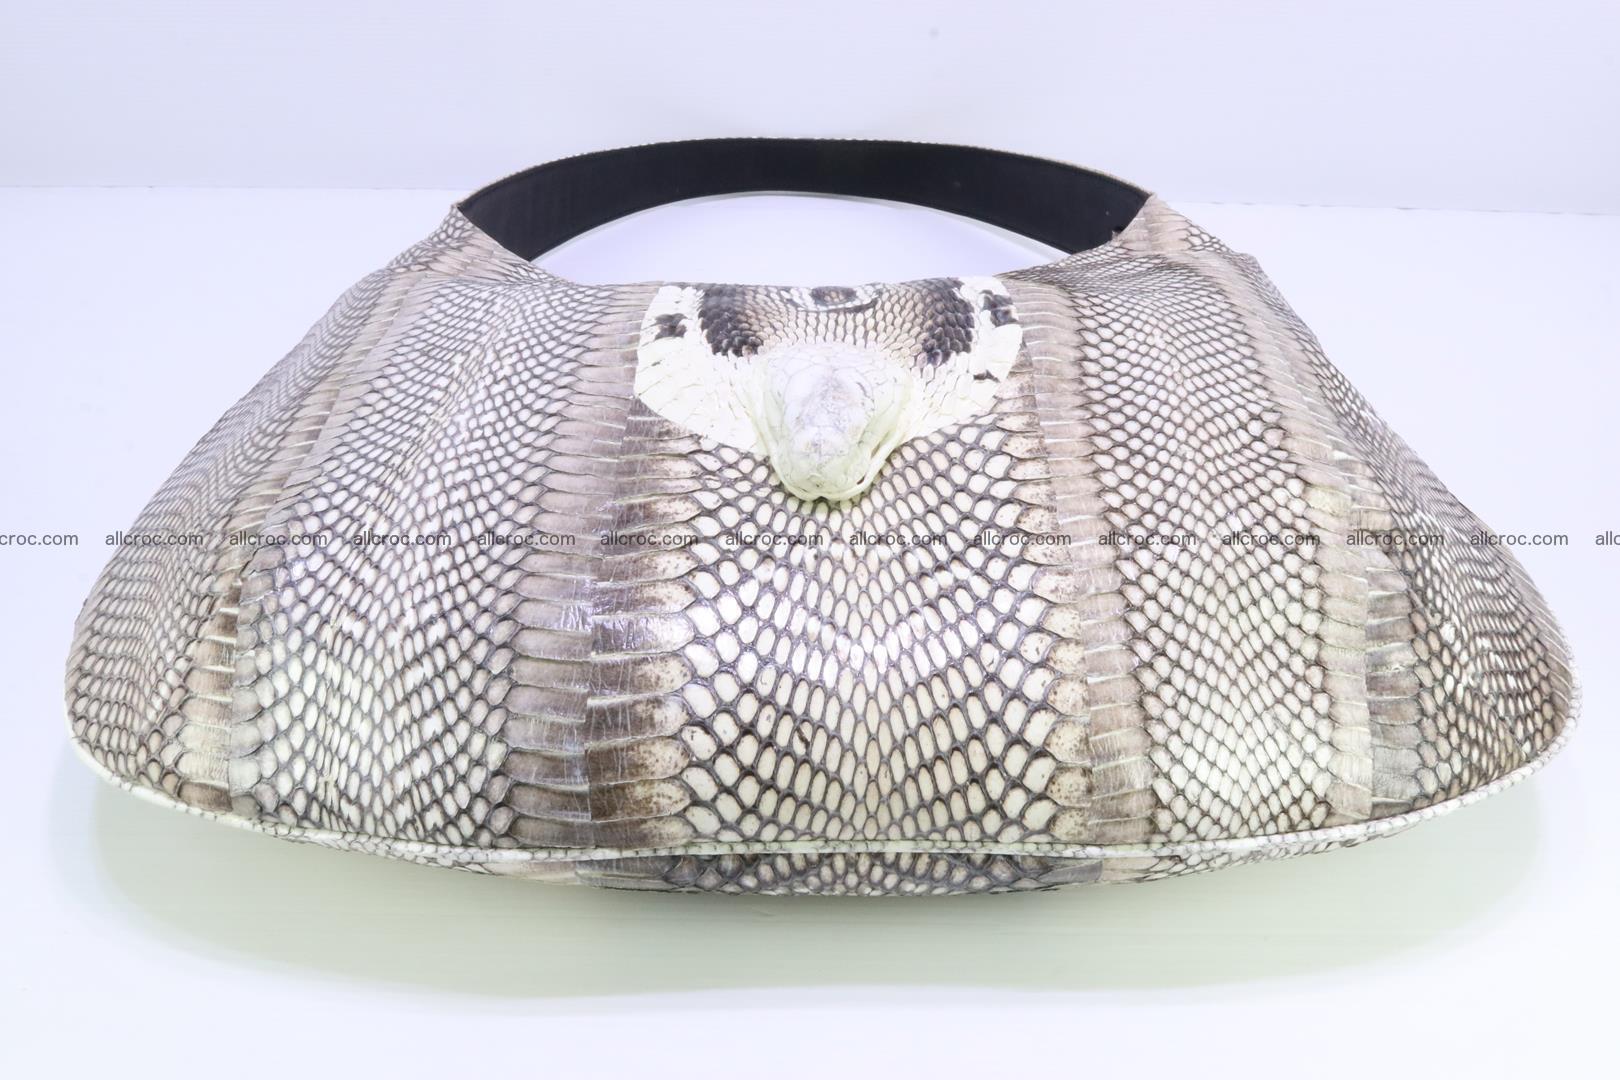 Cobra skin ladies handbag with head of cobra 194 Foto 11